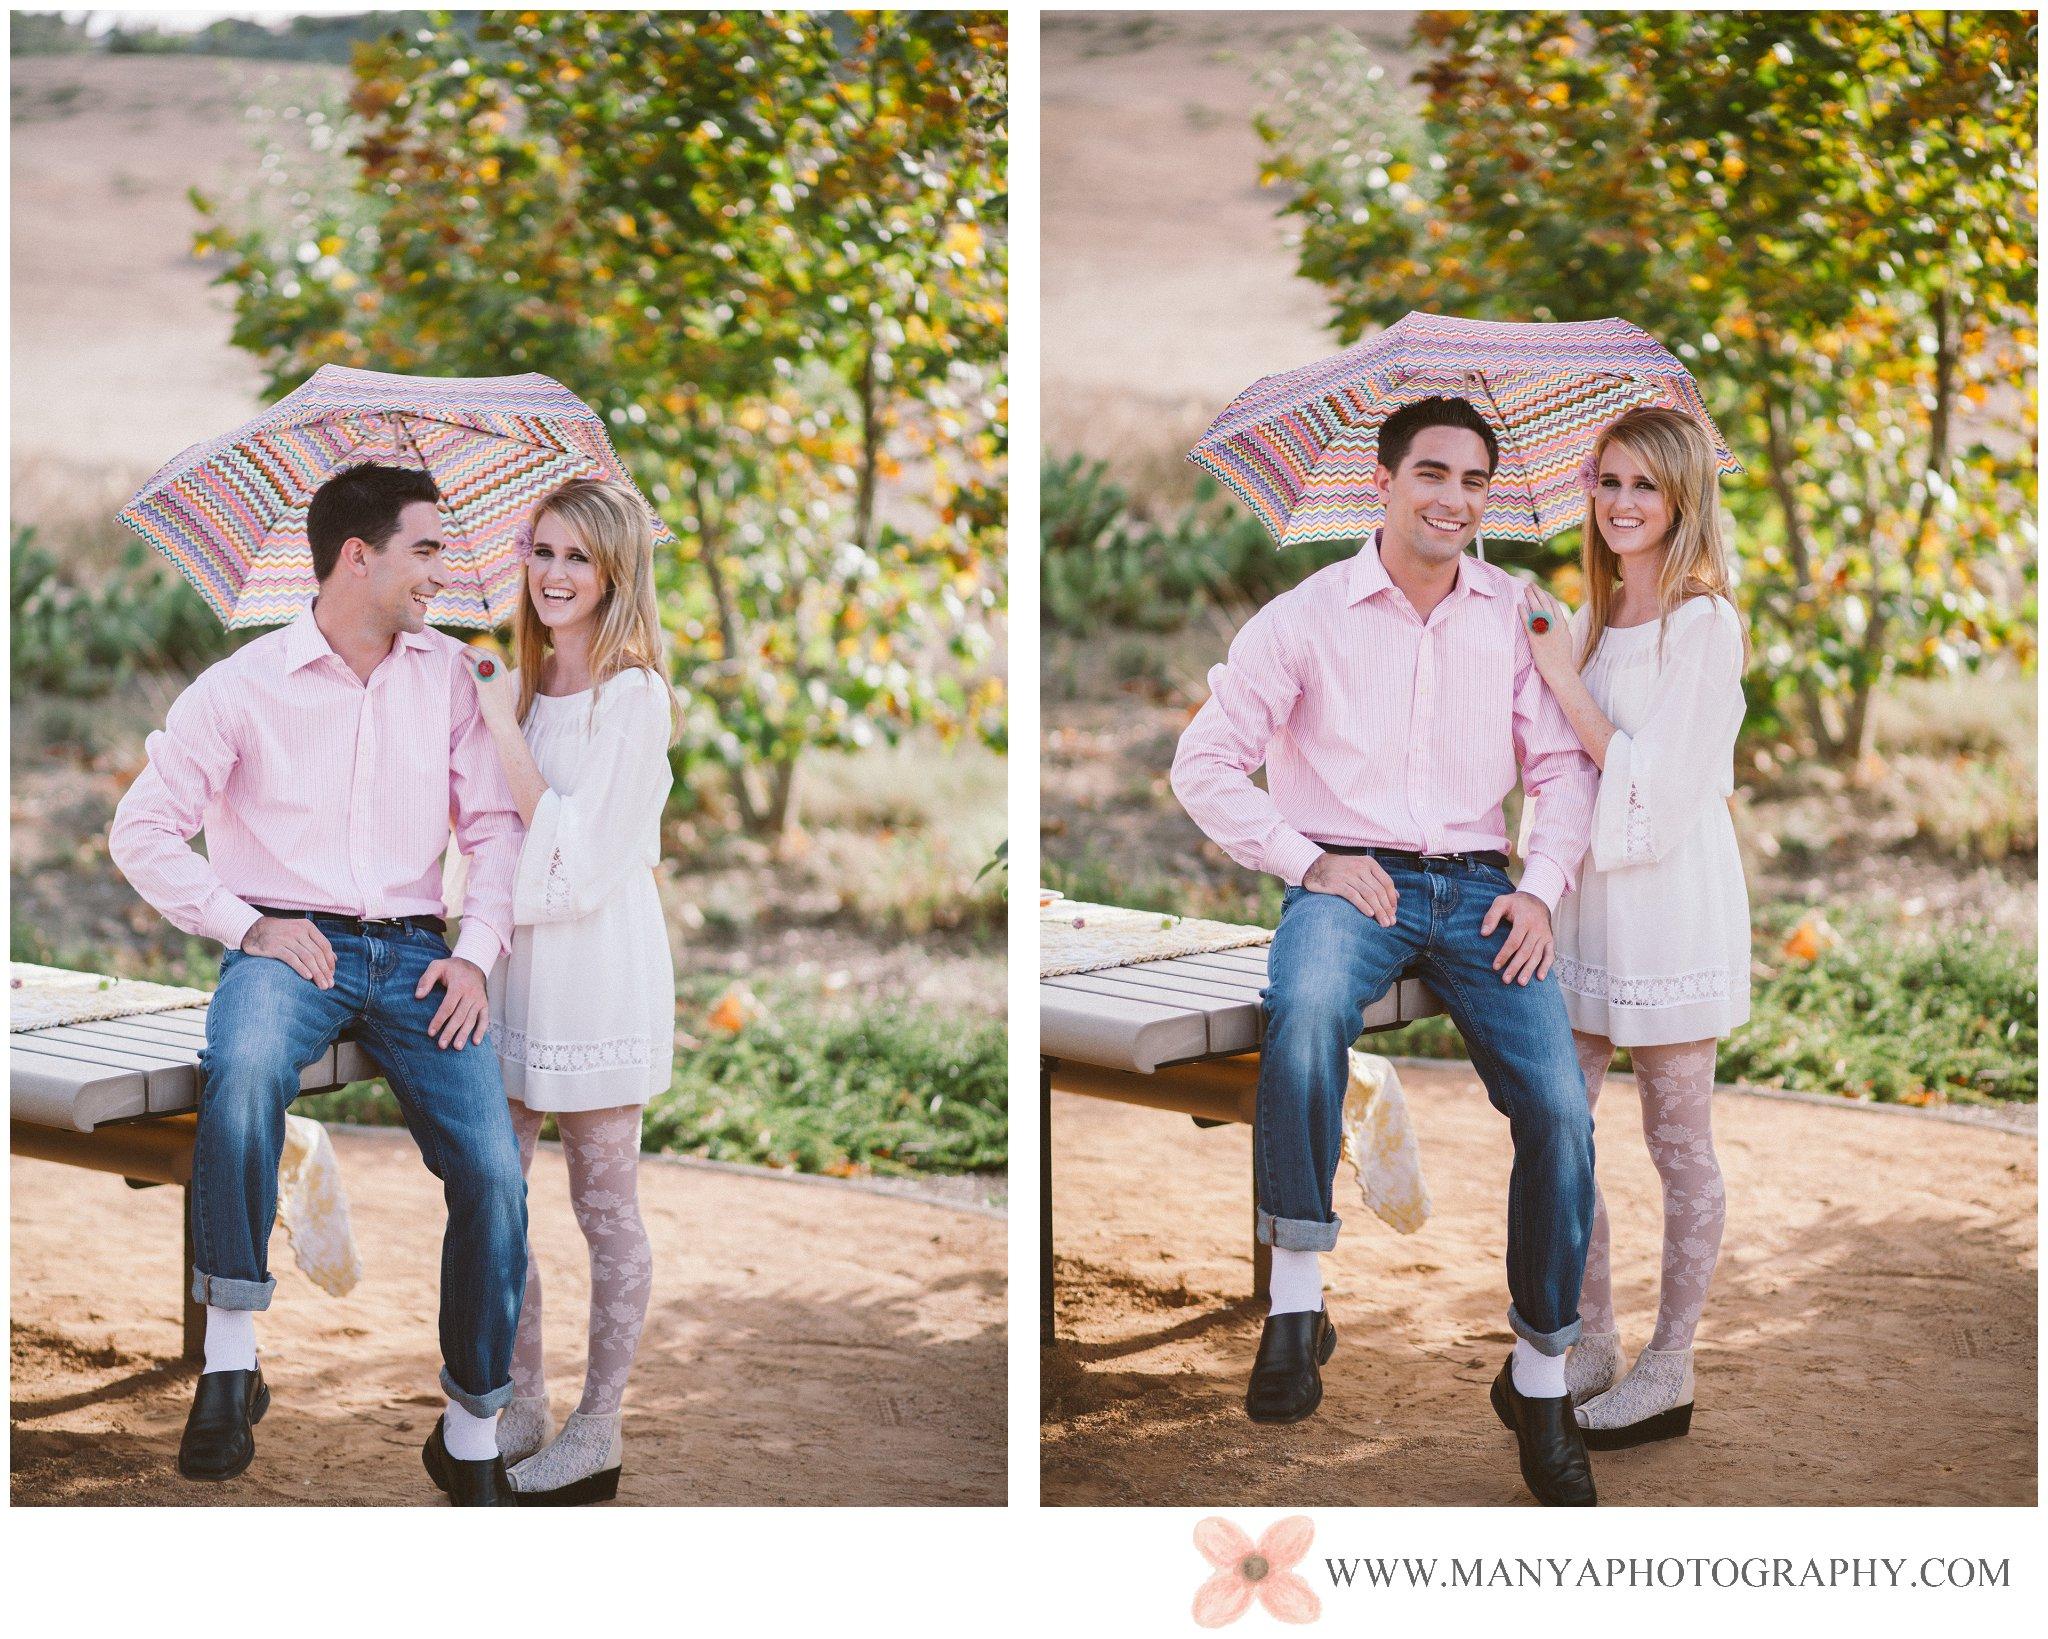 2013-10-17_0003 - Orange County Wedding Photographer